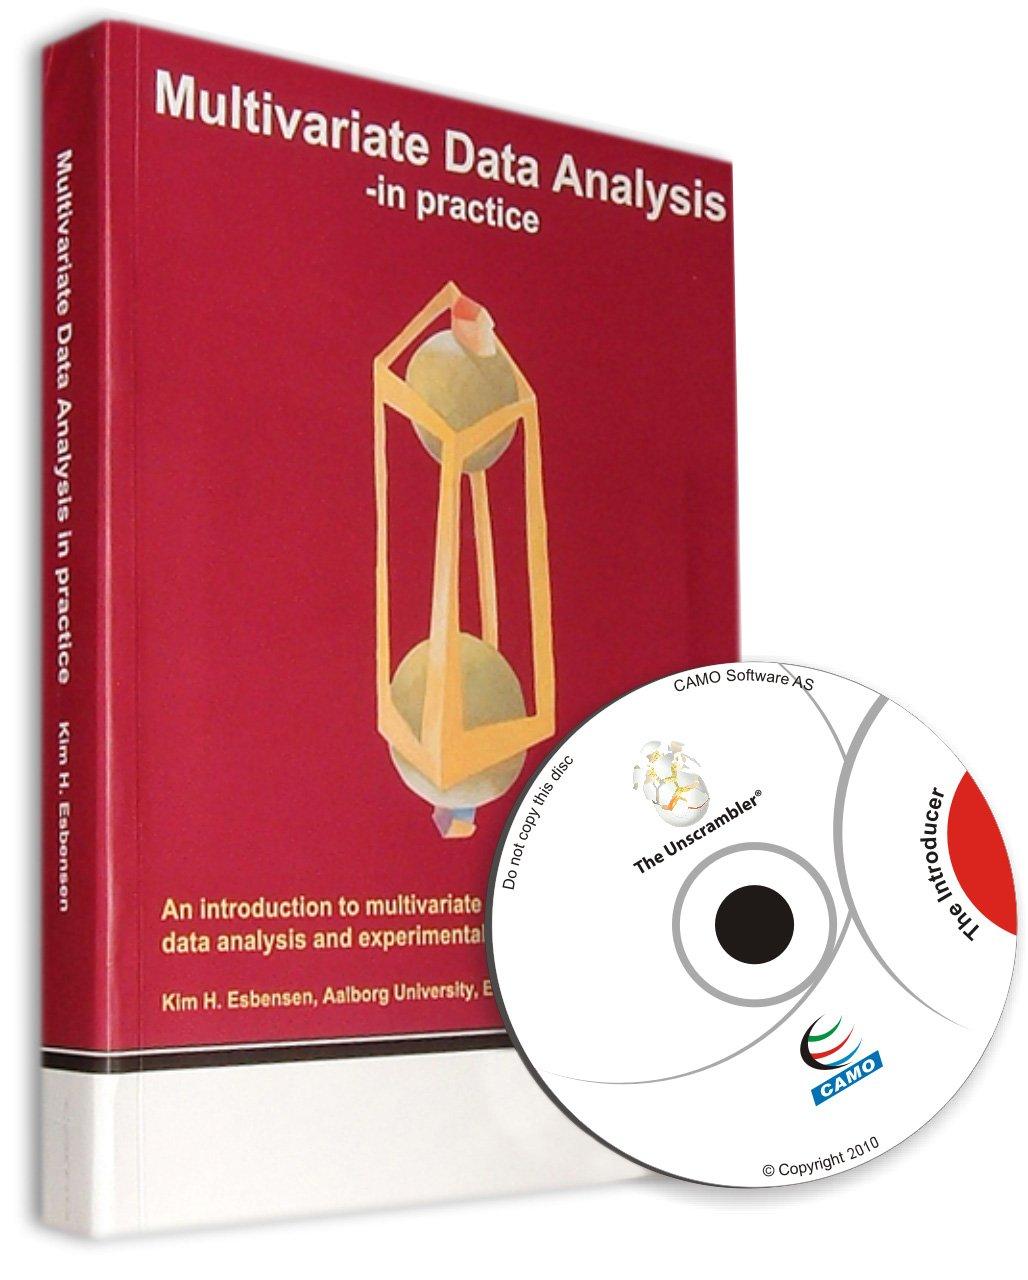 esbensen multivariate data analysis